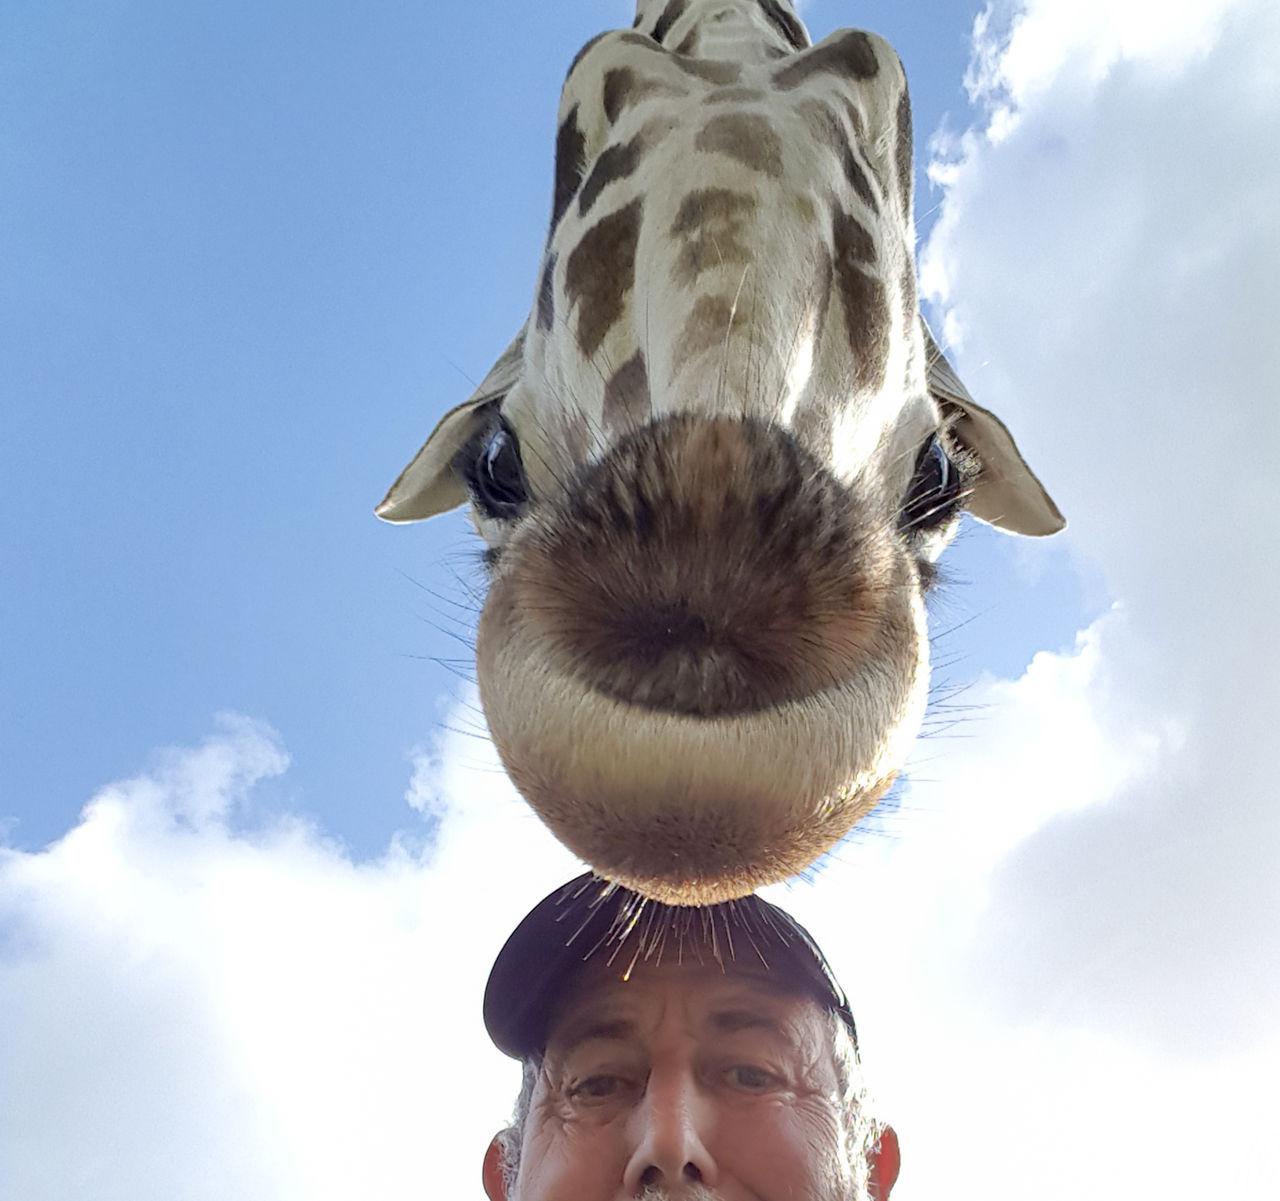 Portrait Of Man And Giraffe Against Sky